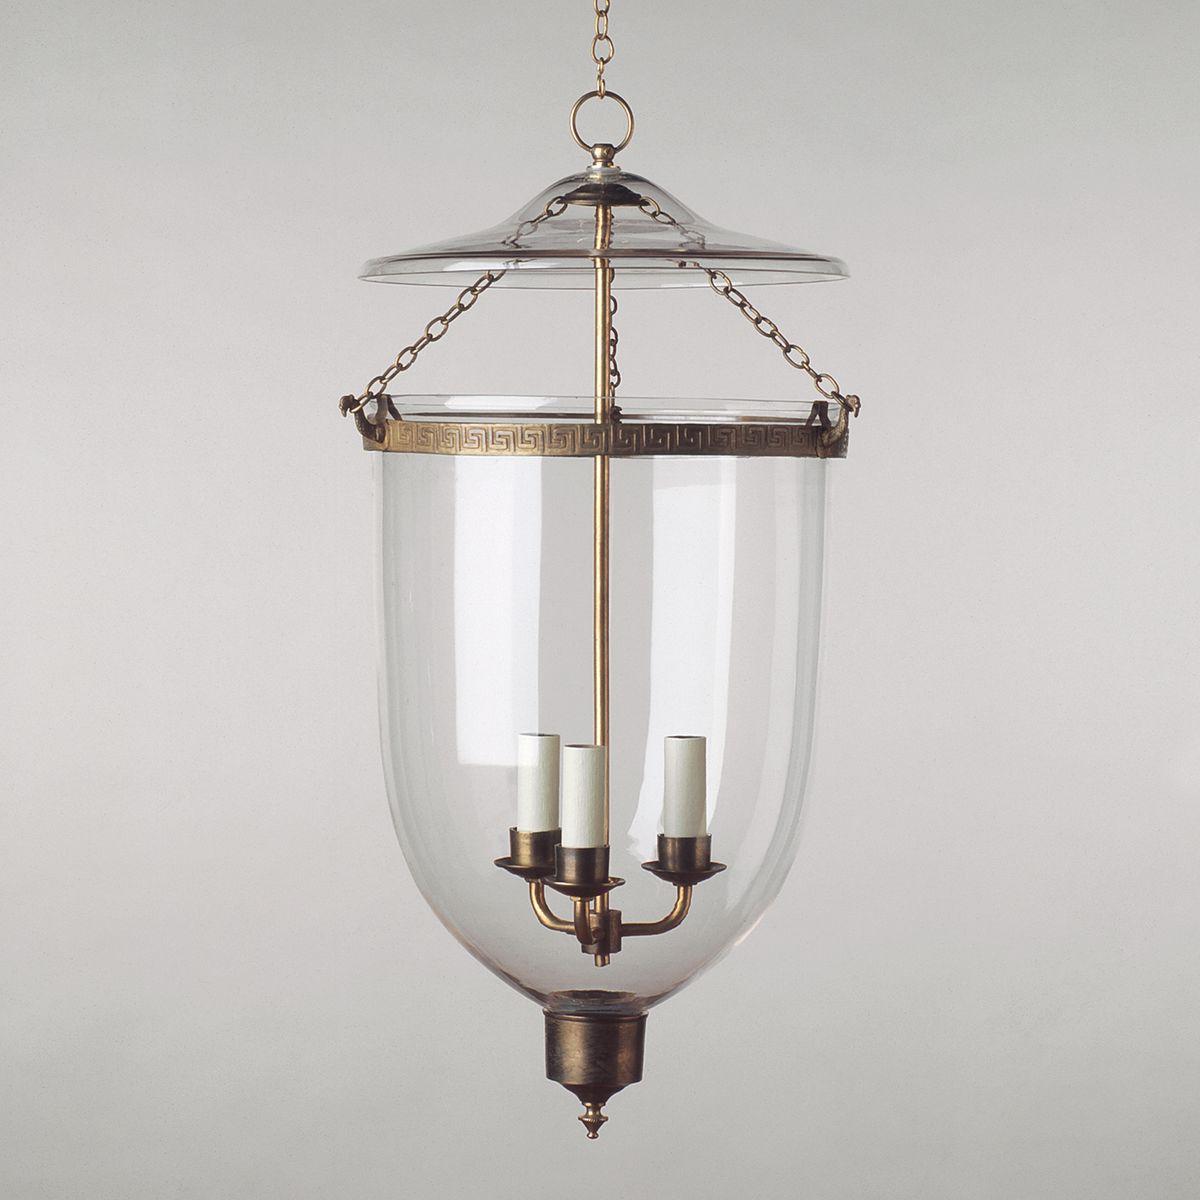 Lanterns Pertaining To Current Tessie 3 Light Lantern Cylinder Pendants (View 10 of 20)